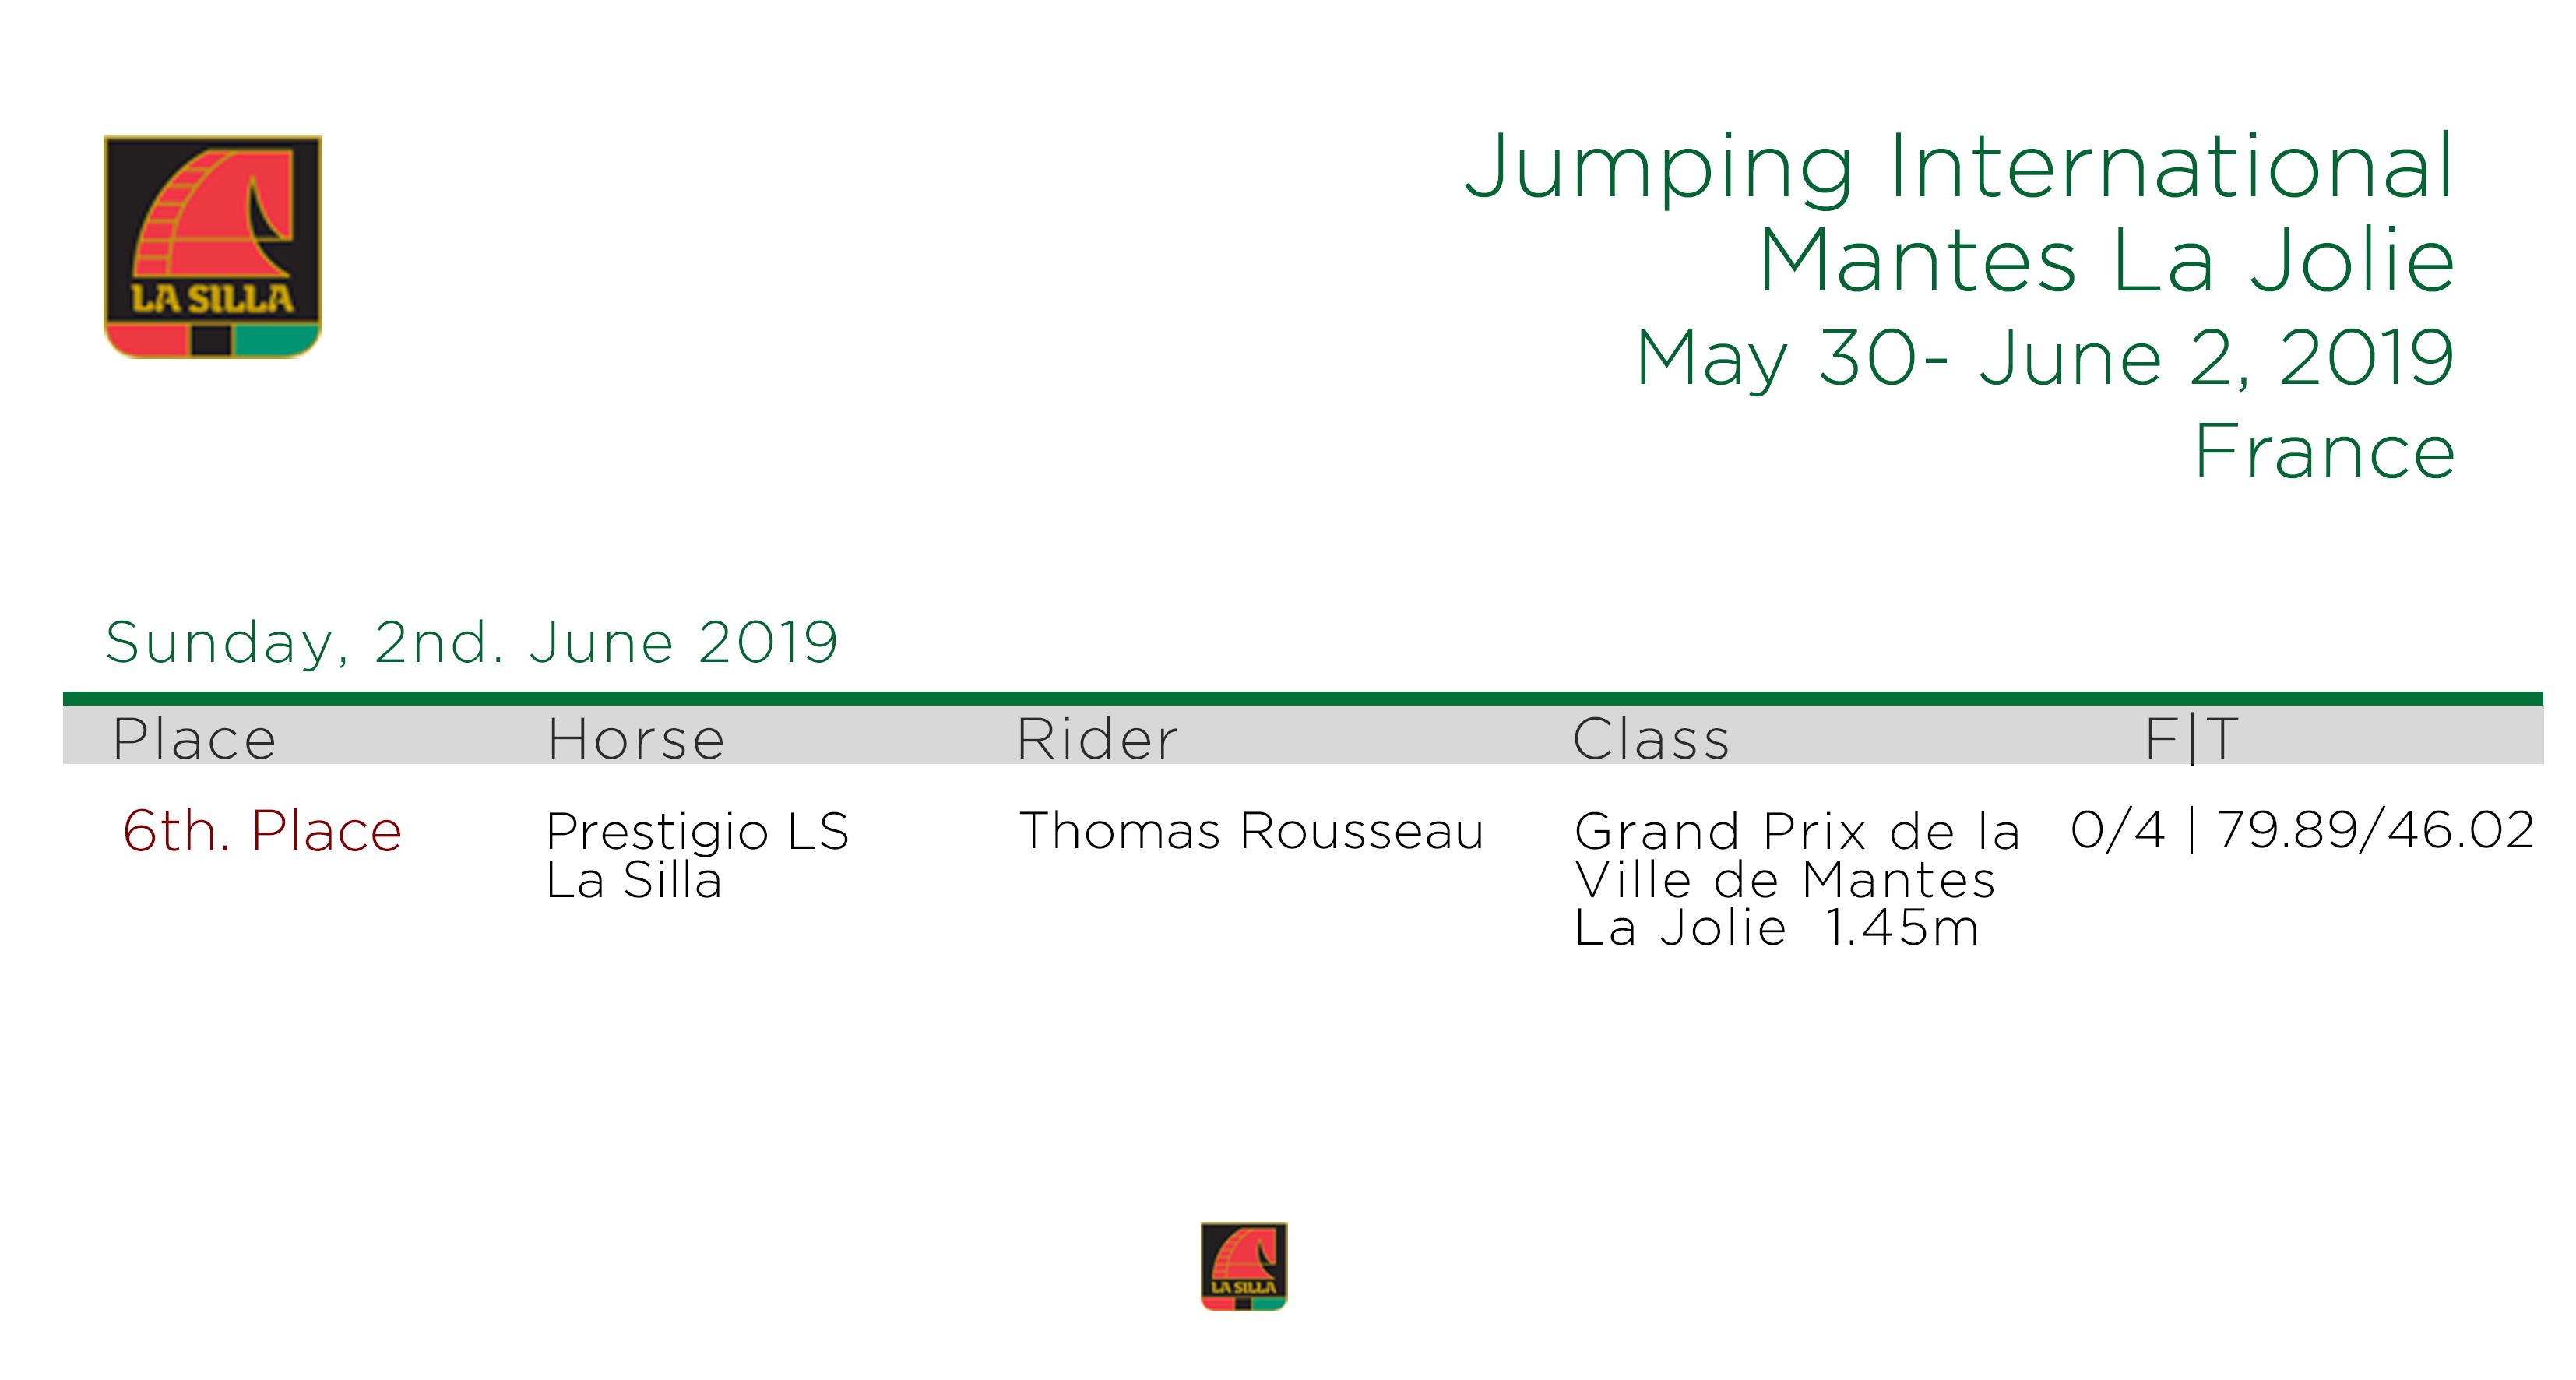 Jumping-International-Mantes-La-Jolie-30-mai---02-jui-2019-France